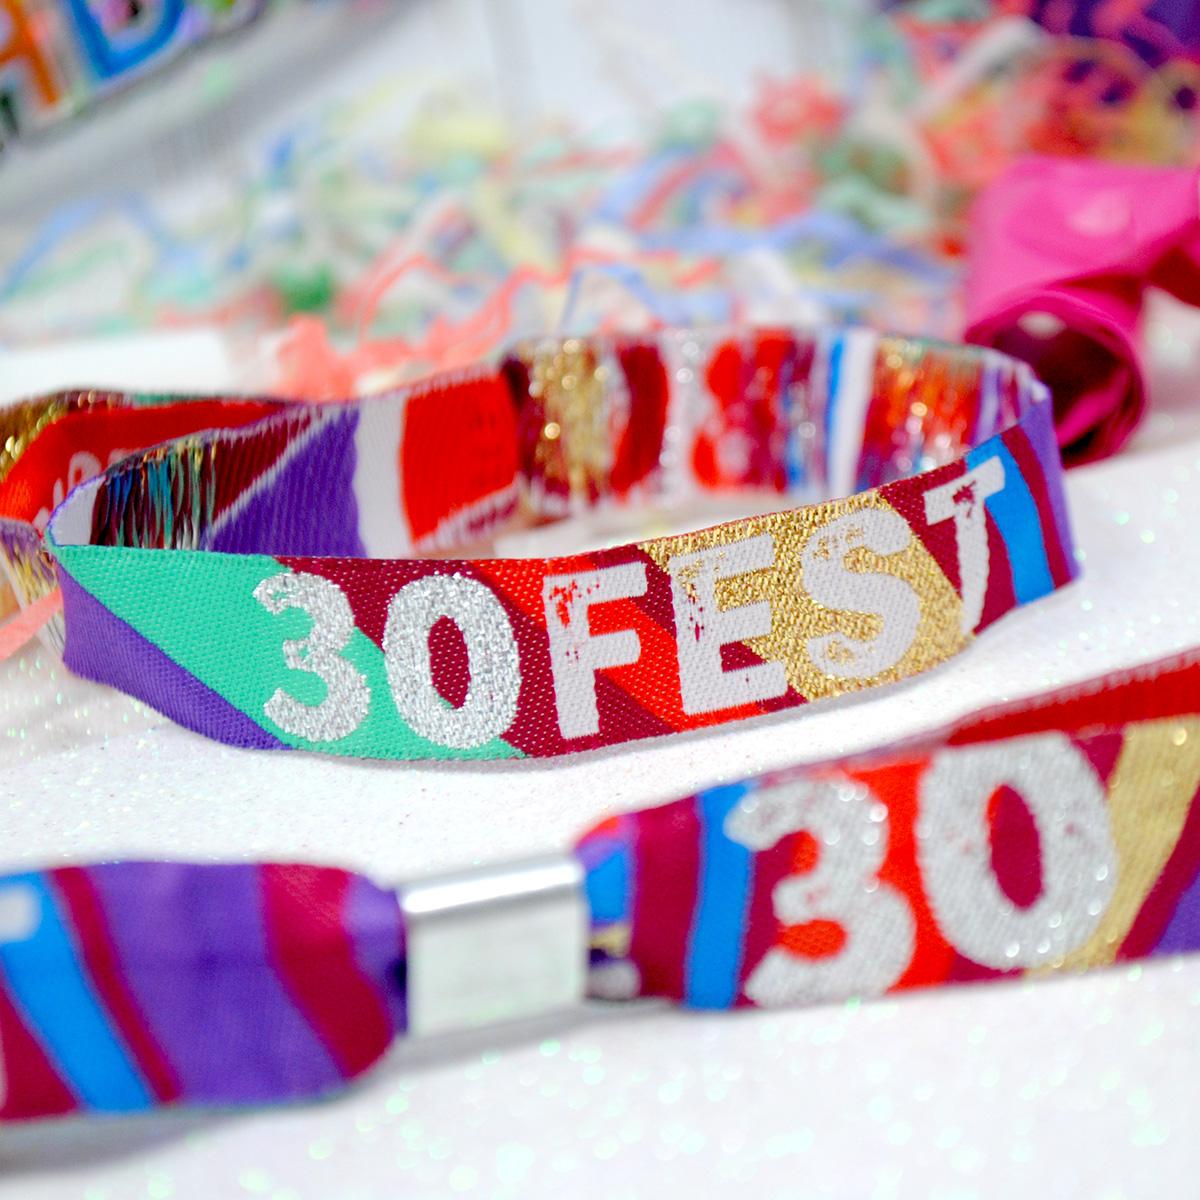 30fest festival theme birthday party wristbands